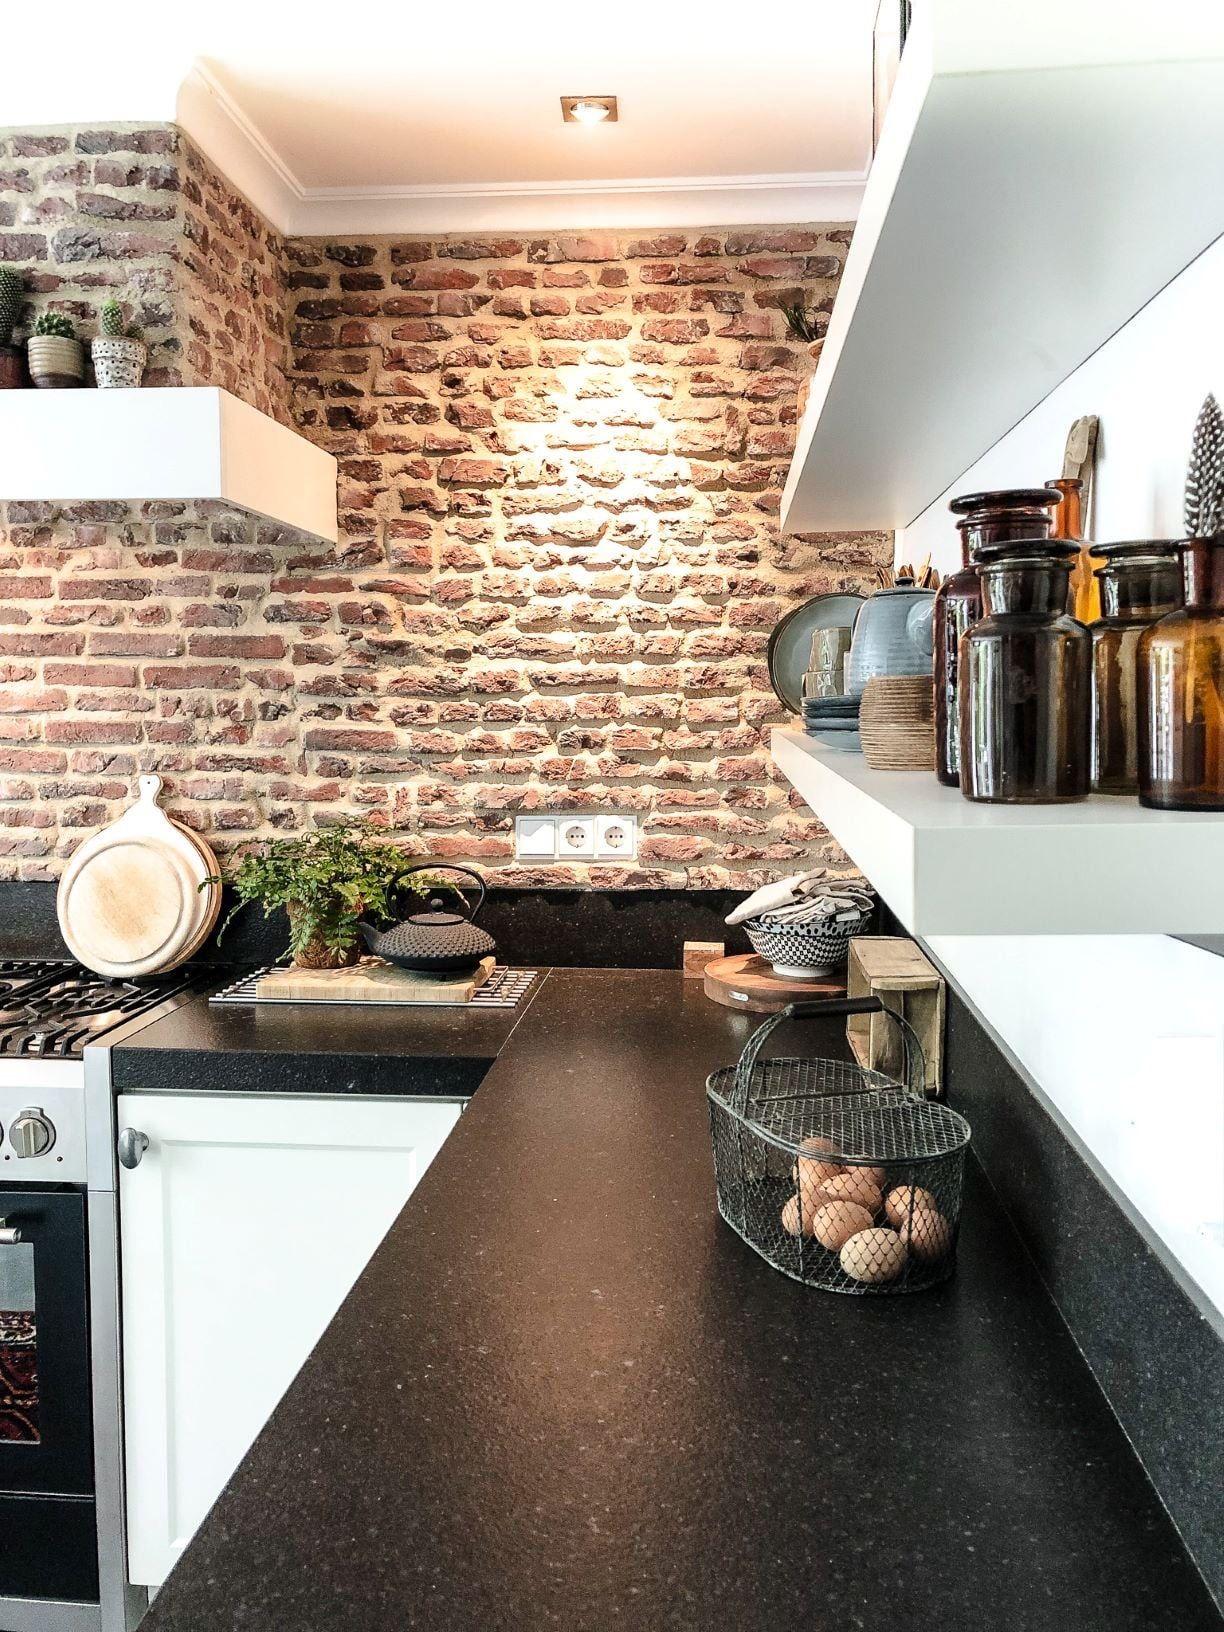 Pin by Ana Ana on Keuken   Brick wall kitchen, Kitchen interior ...